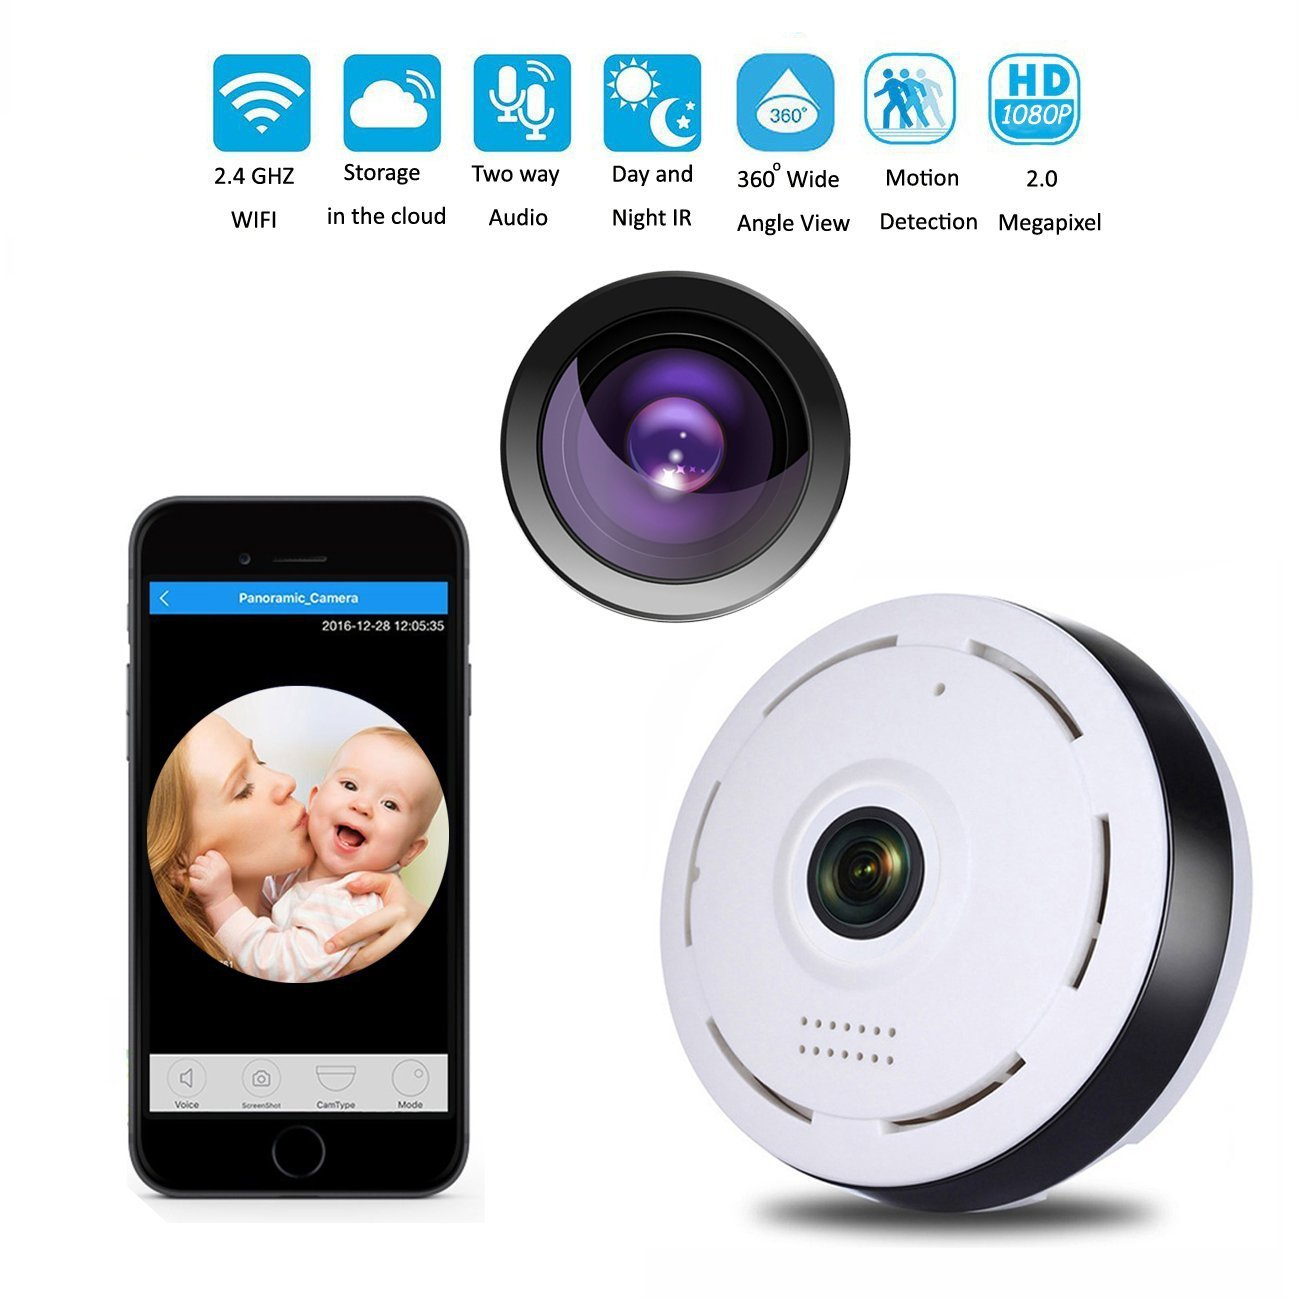 WiFi Wireless Panoramic Camera HD 360 Degree Night Vision Fisheye Security Camera white_US plug